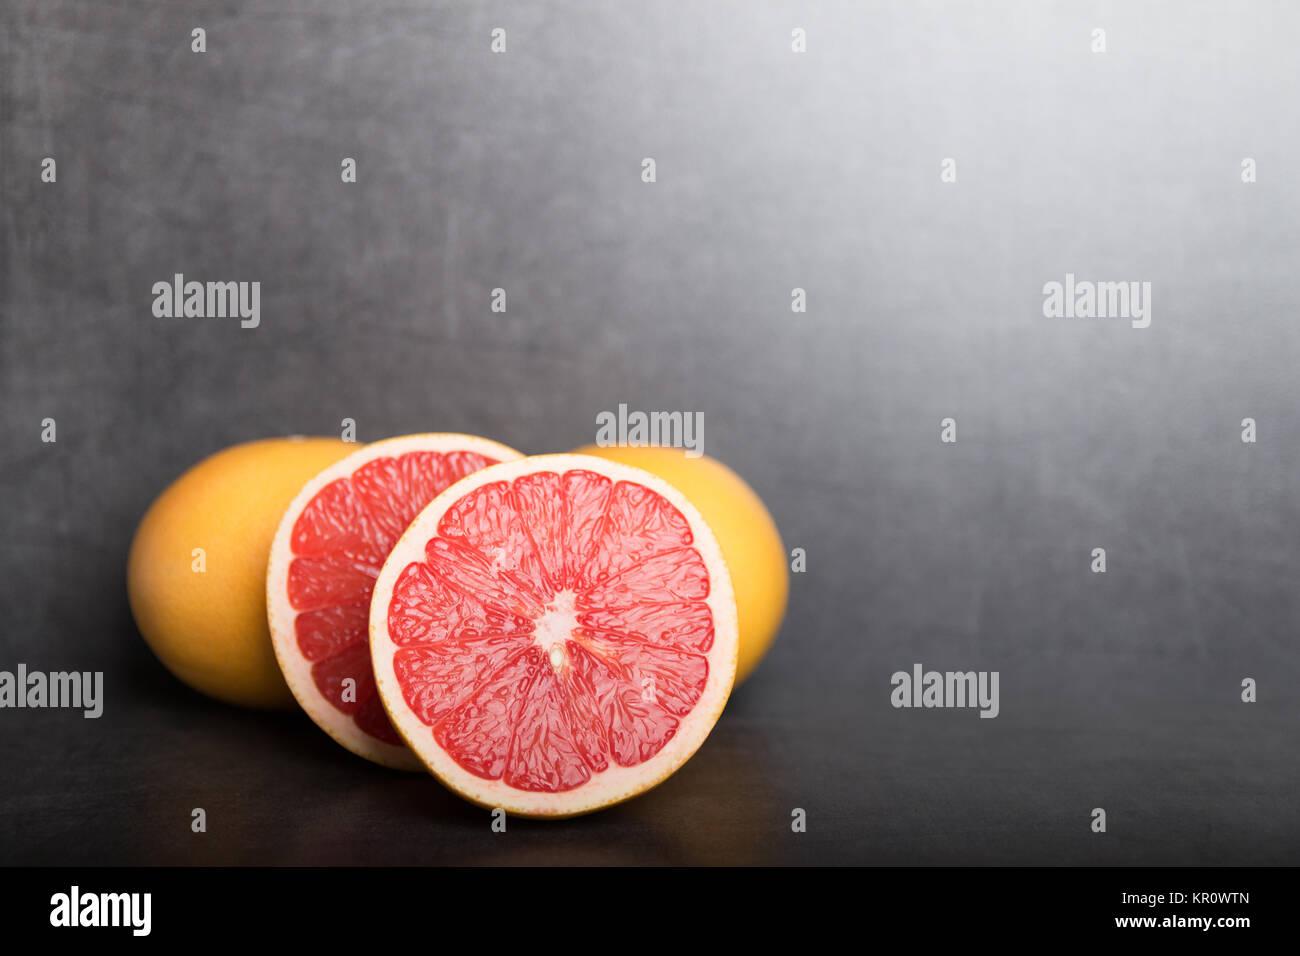 variation of grapefruit - Stock Image